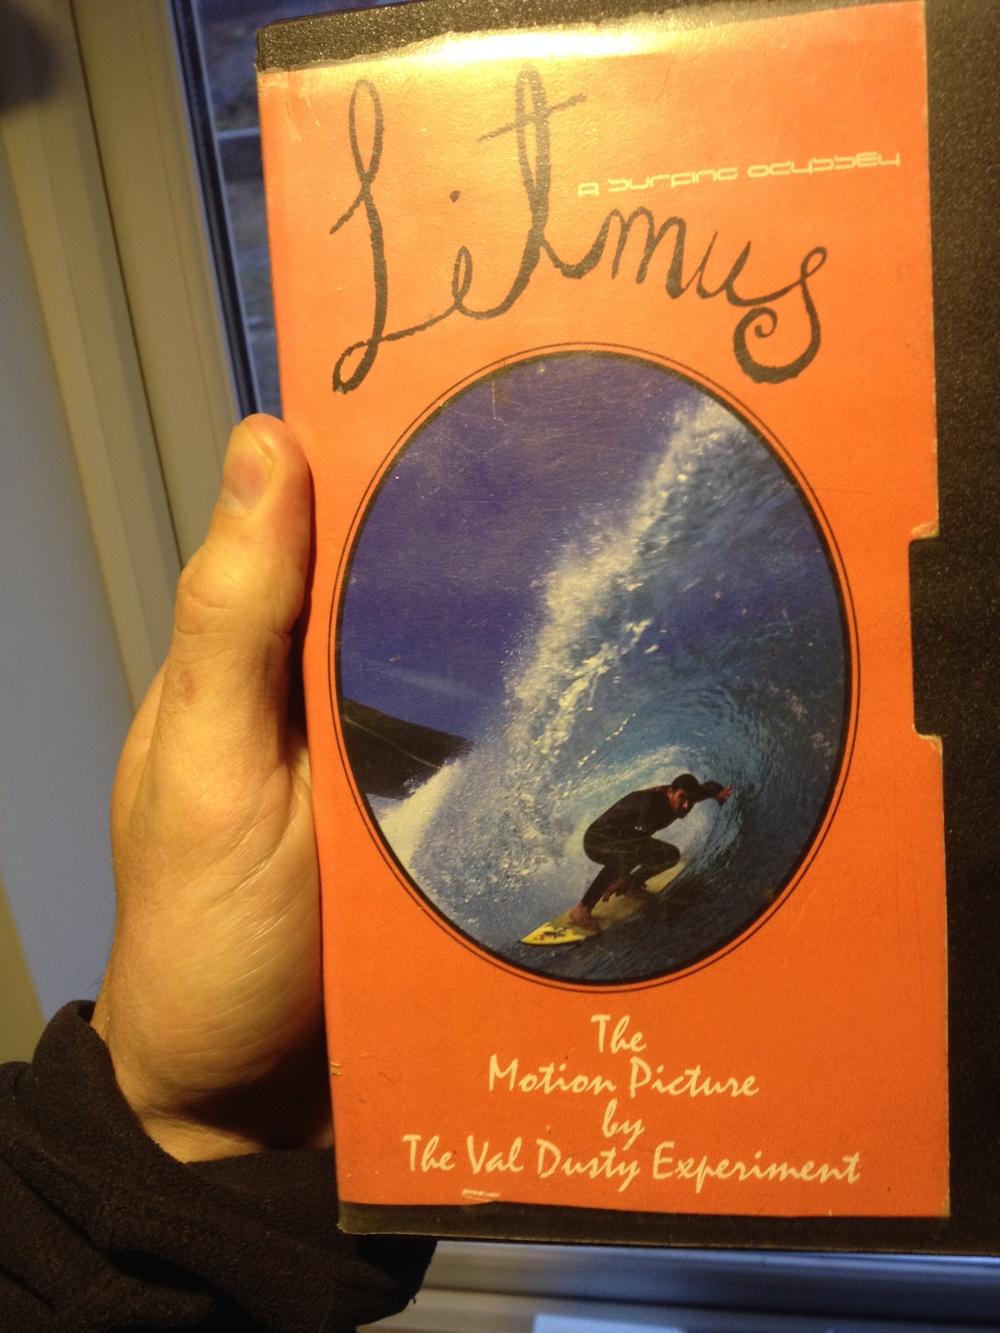 MyVHS of Litmus